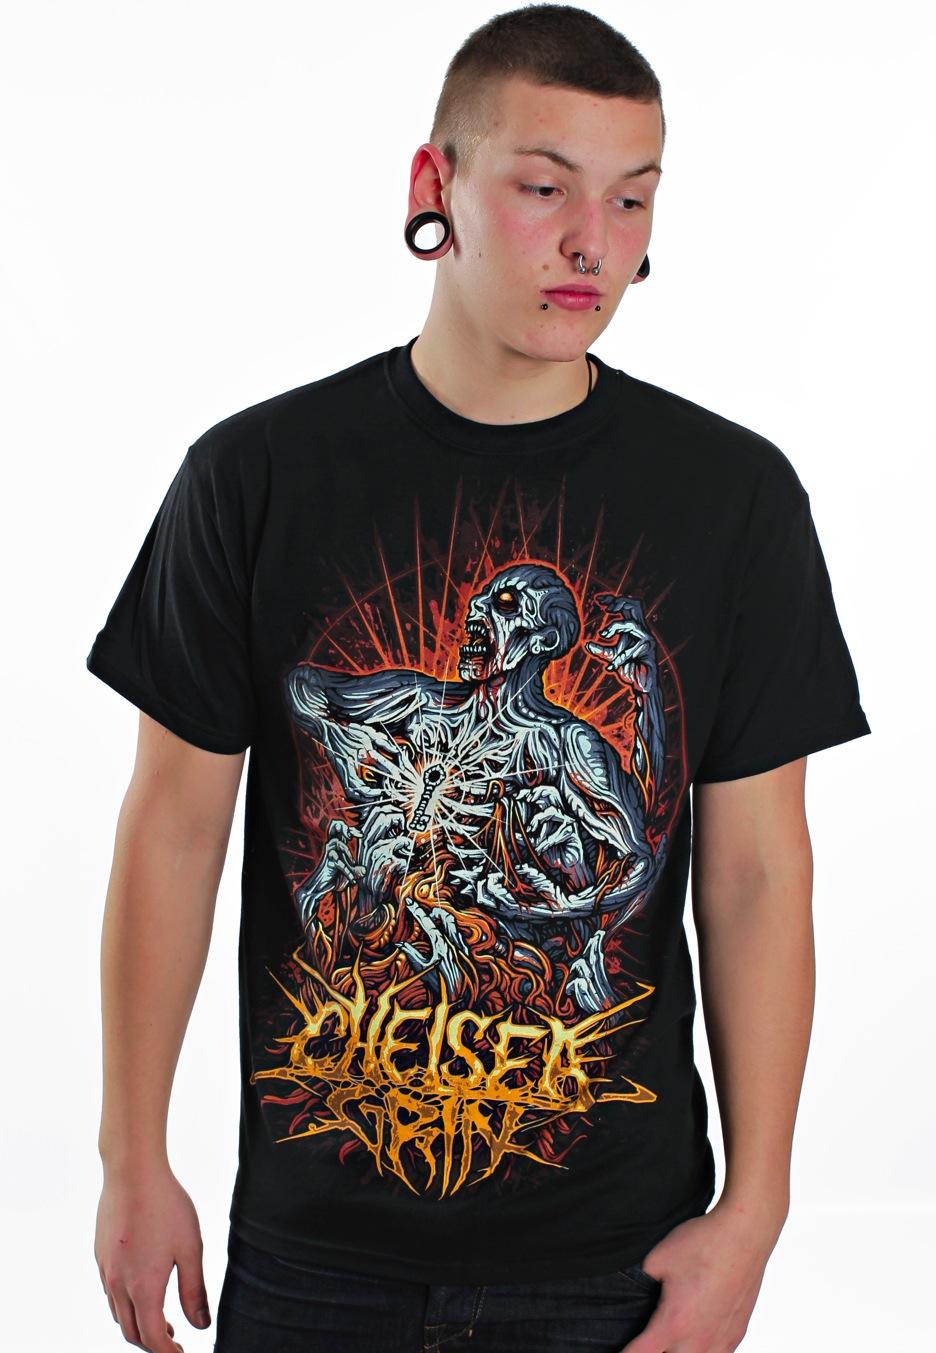 chelsea grin the key t shirt official deathcore merchandise shop worldwide. Black Bedroom Furniture Sets. Home Design Ideas